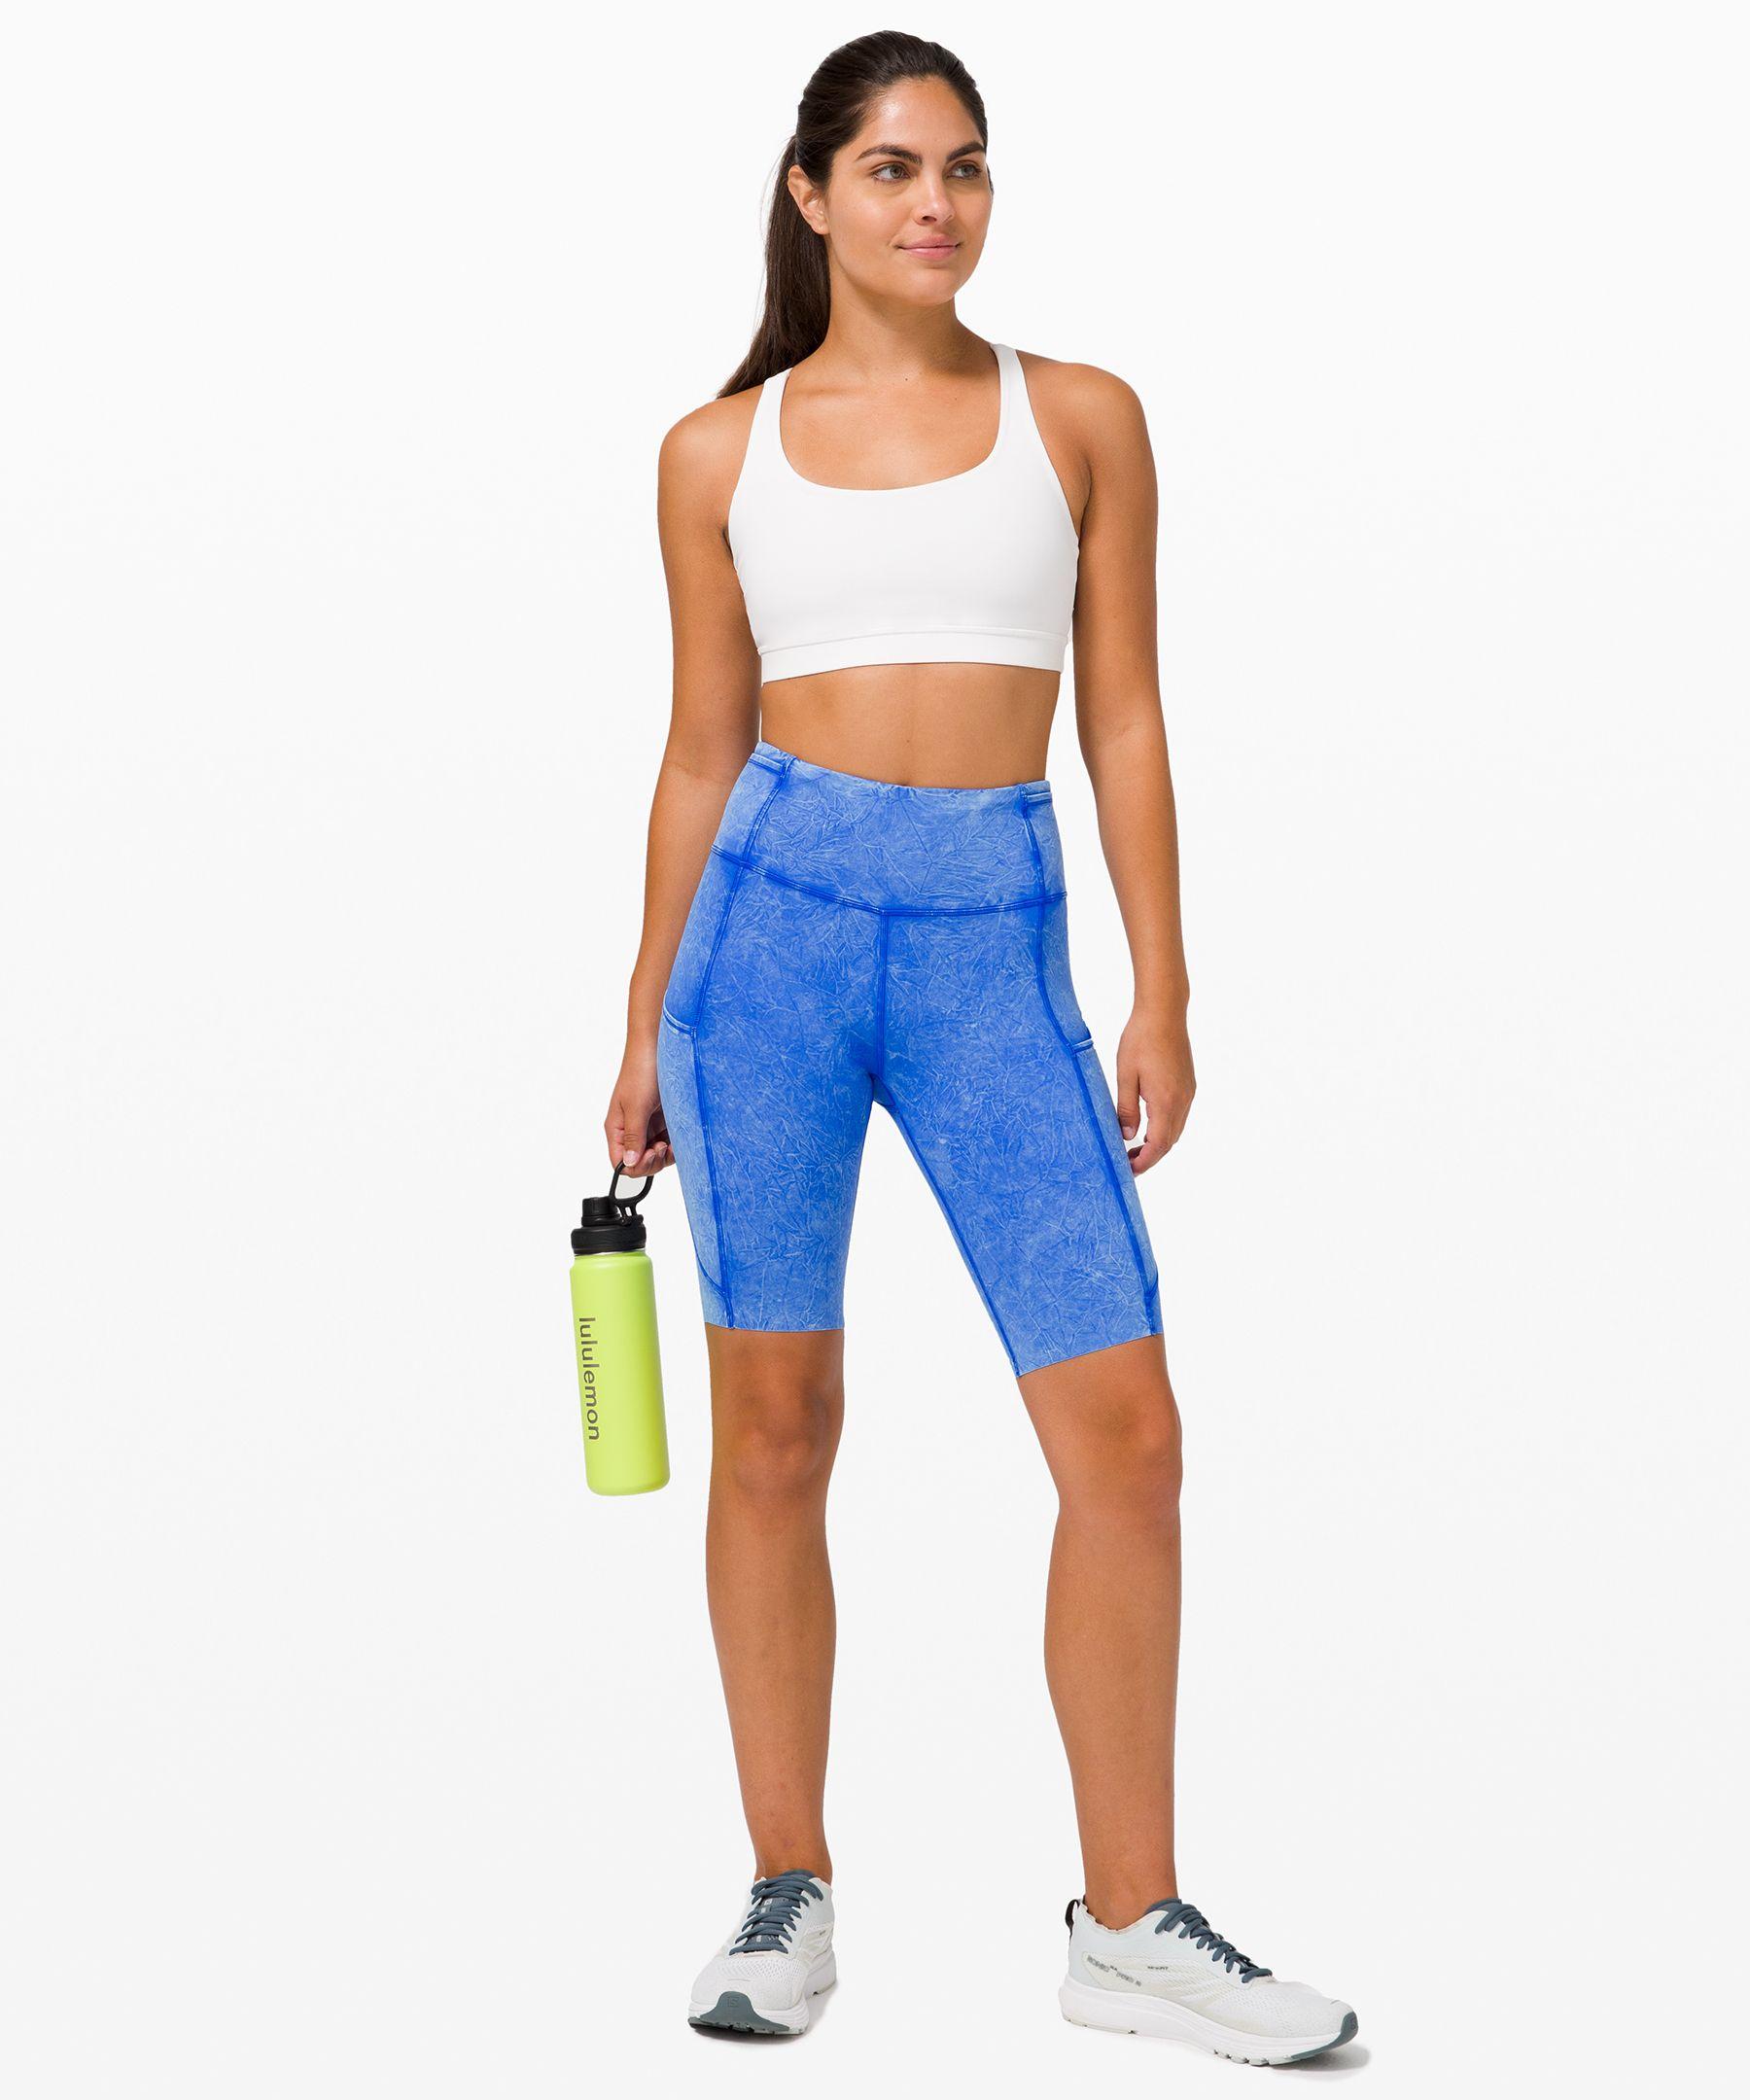 Athletic Apparel Technical Clothing Lululemon